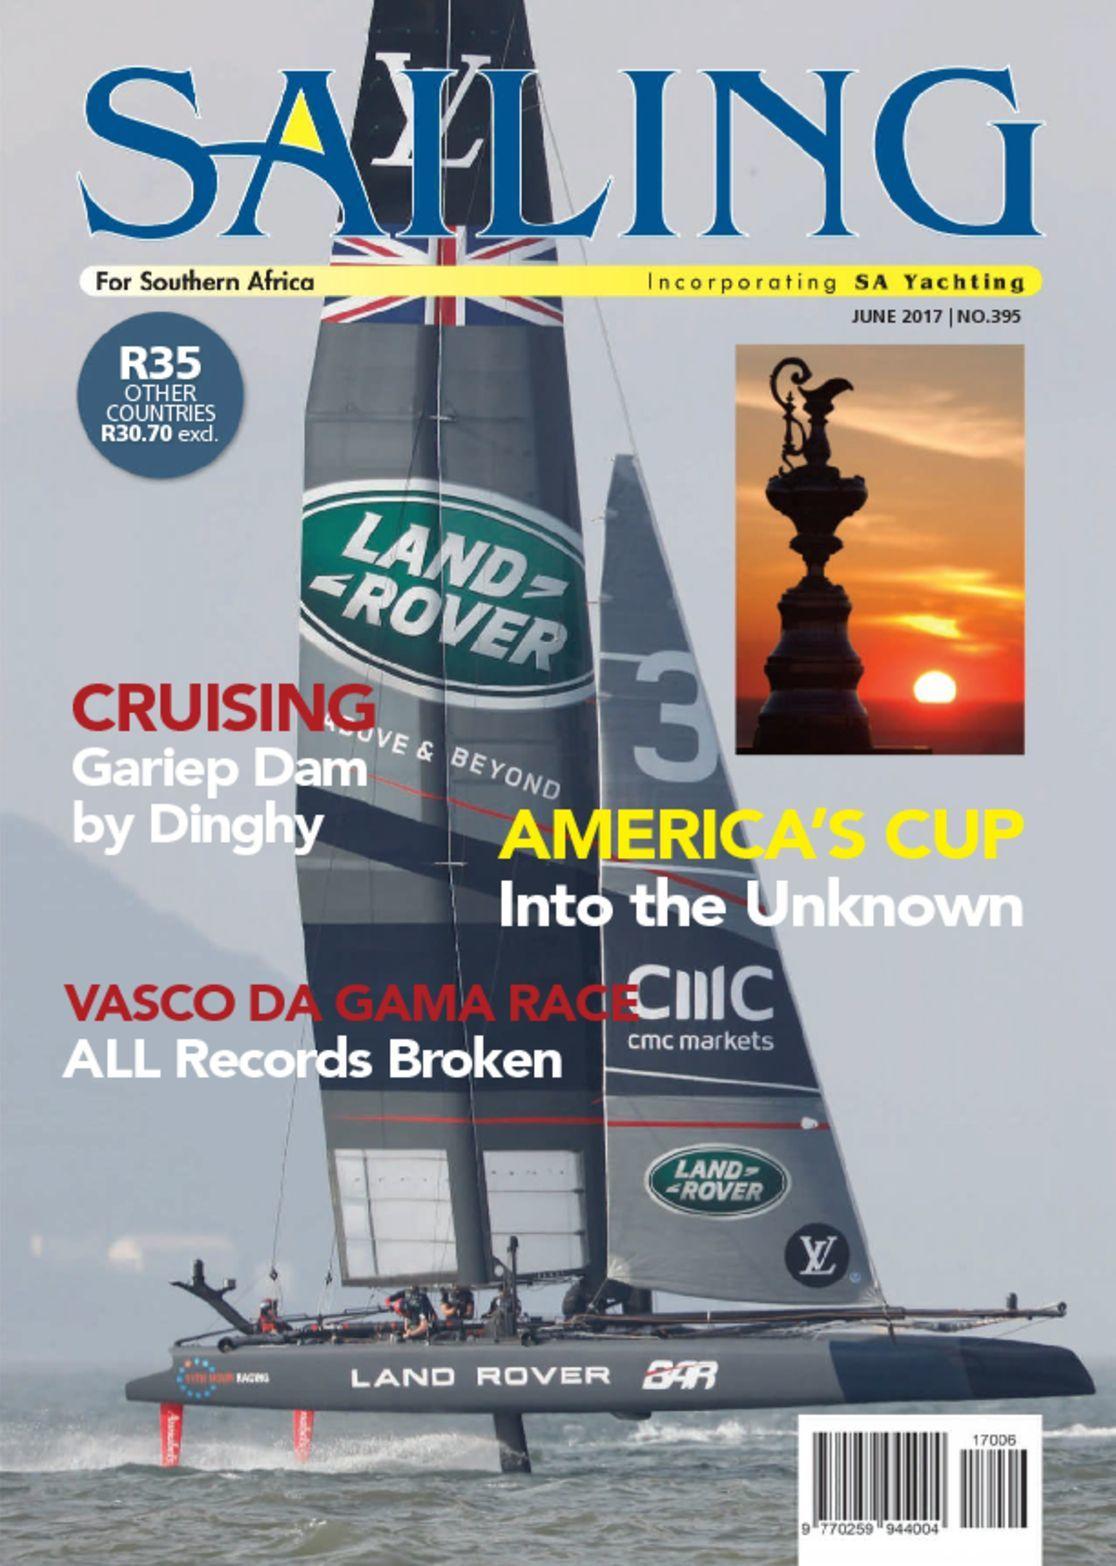 Sailing incorporating sa yachting magazine digital for Sa fishing promo code free shipping